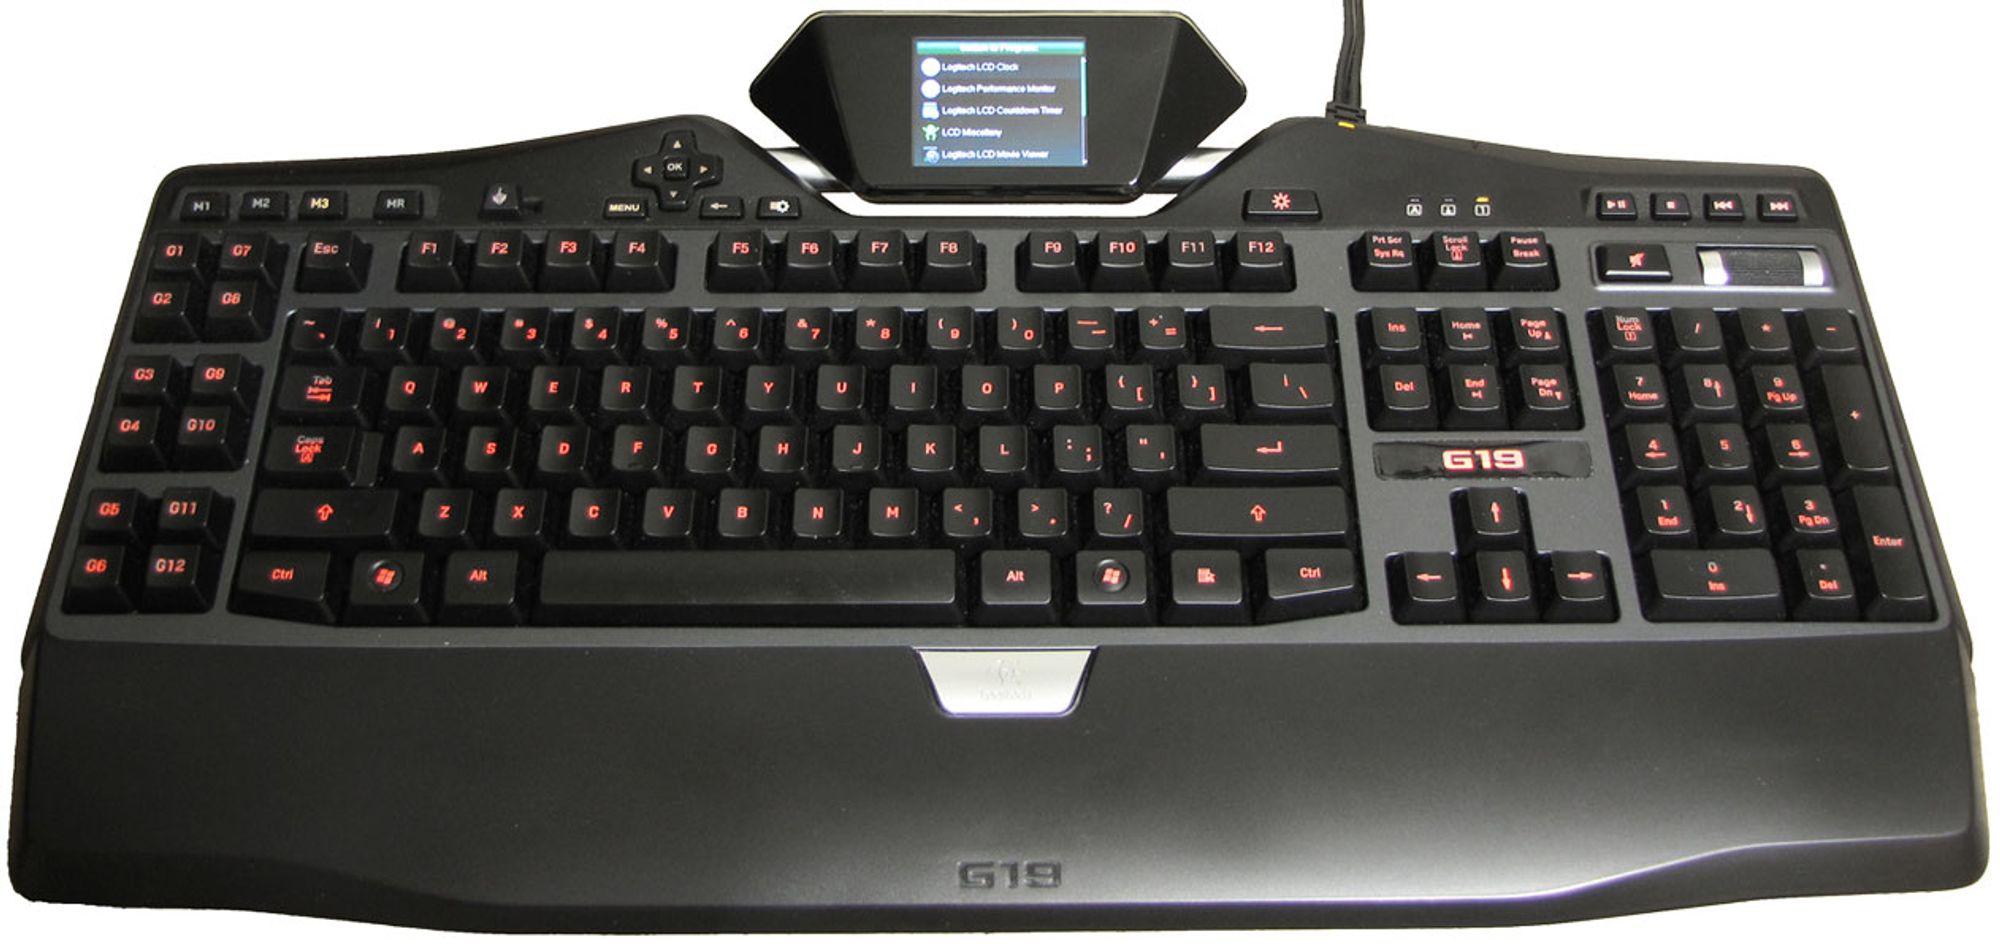 http://img.gfx.no/610/610962/logitech-g19-gaming-keyboard-full.jpg